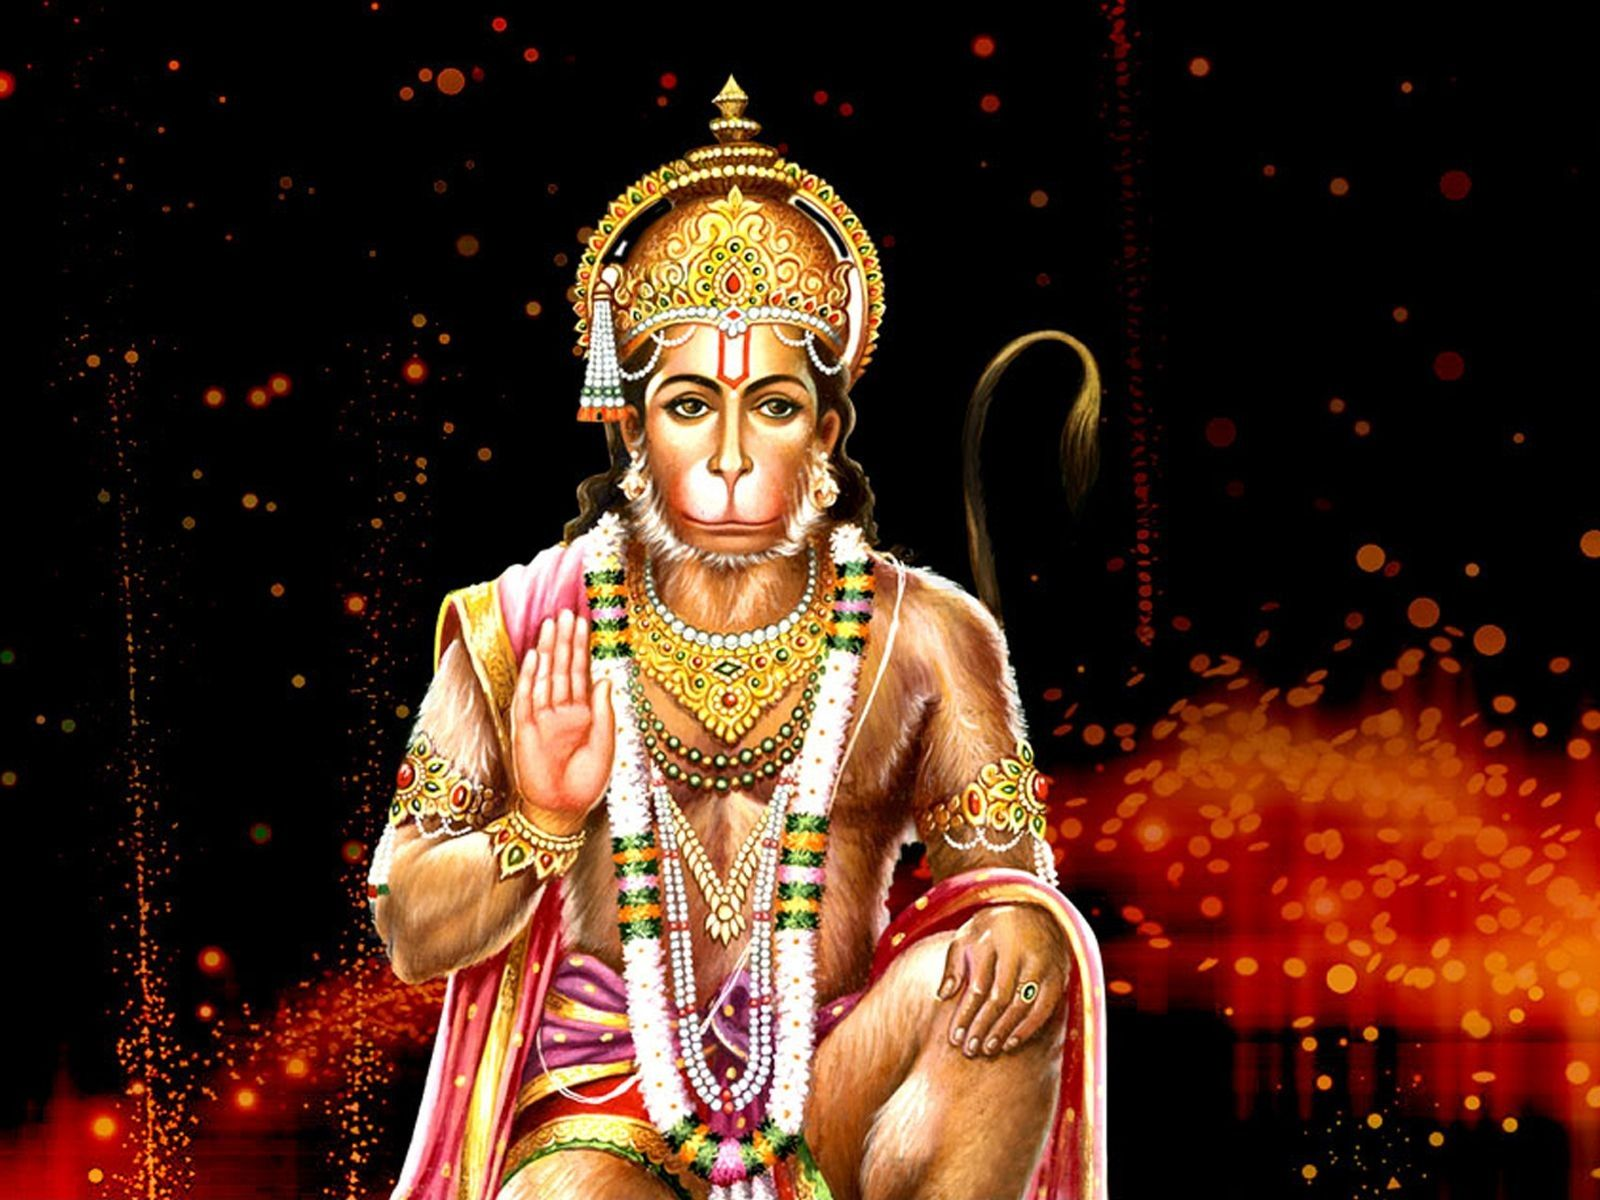 shri hanuman ji full size hd pictures u2013 latest festival wishes